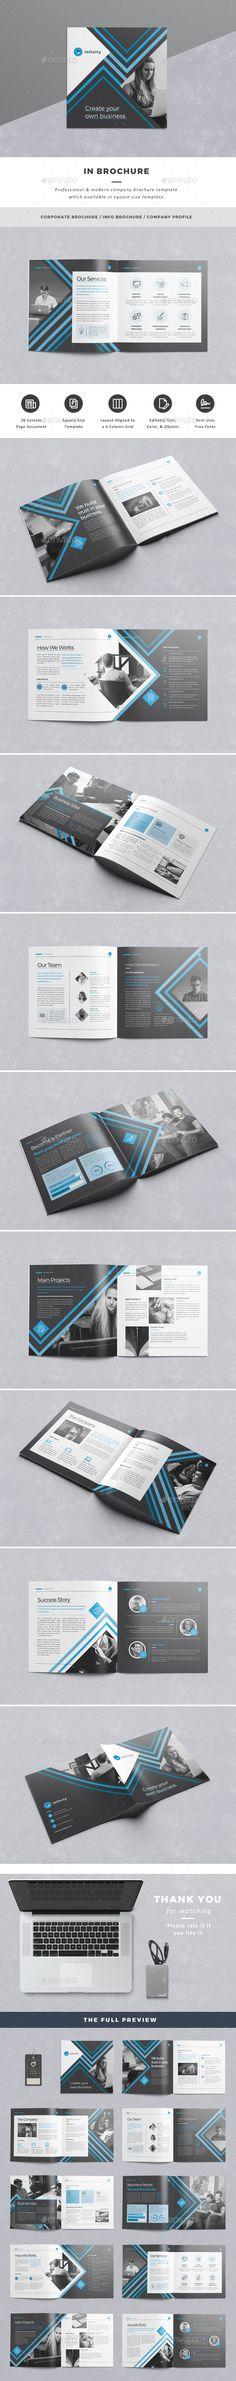 In Brochure Templates InDesign INDD. Download here: http://graphicriver.net/item/in-brochure/16329033?ref=ksioks